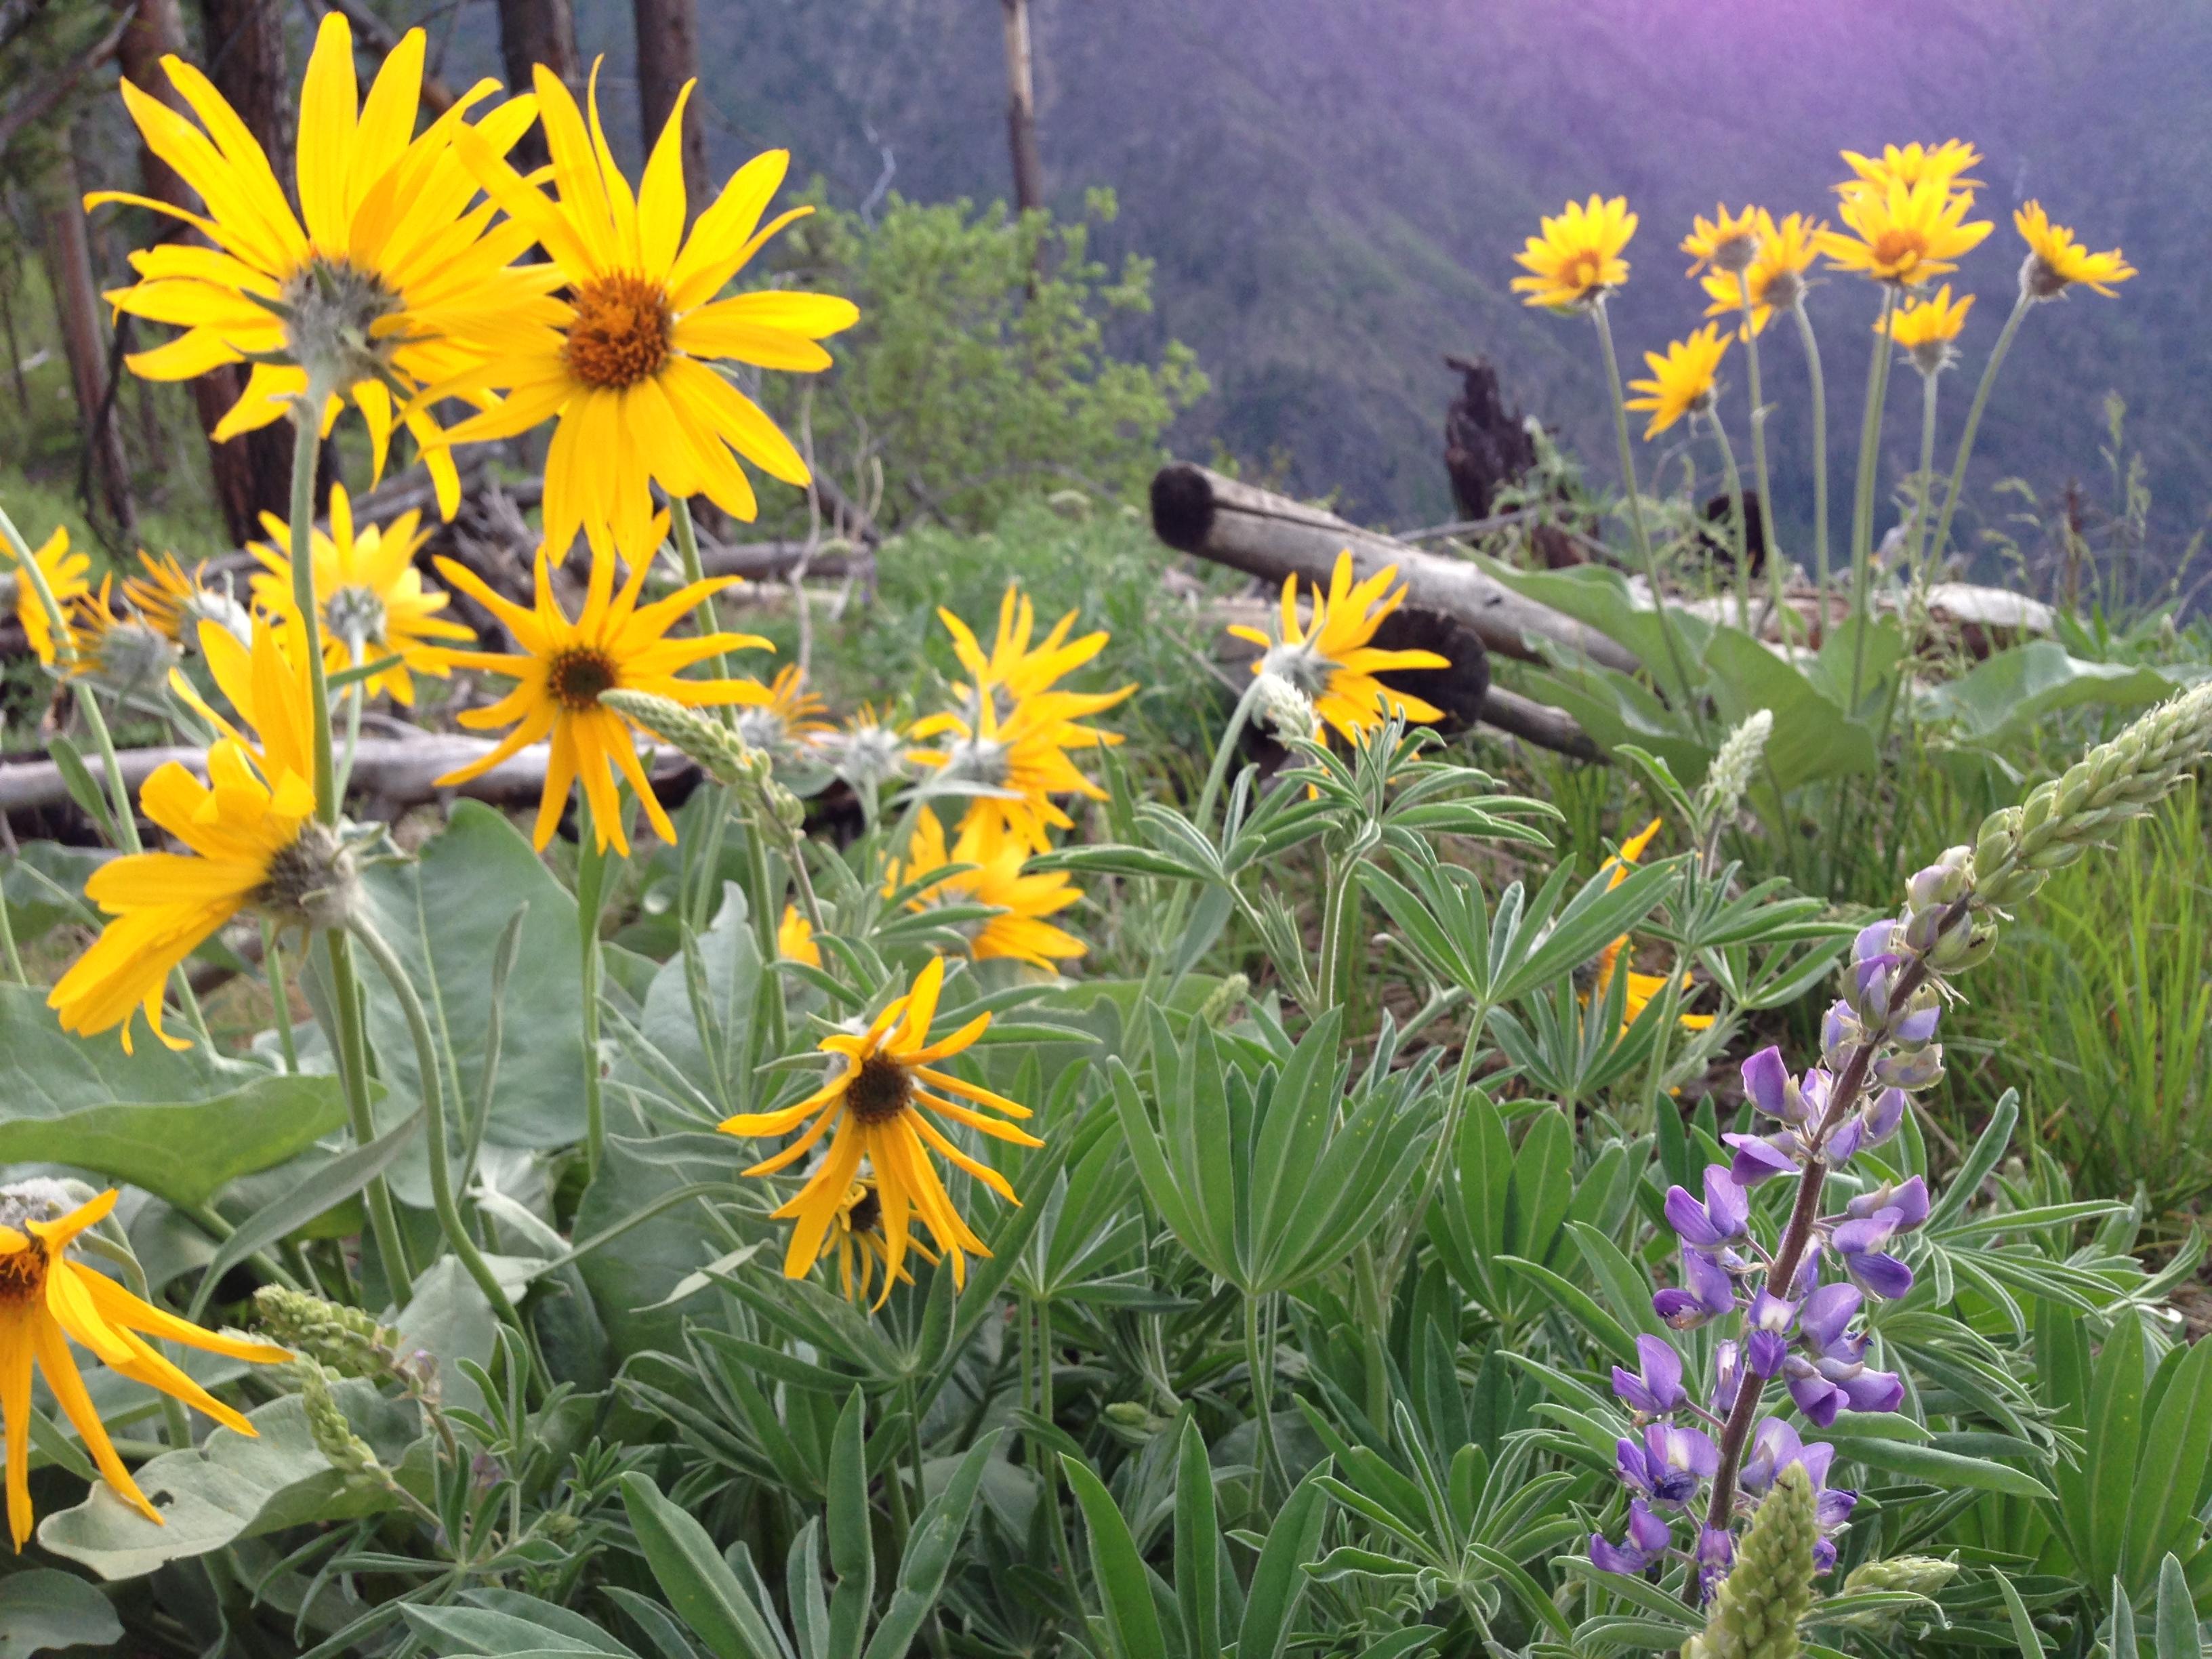 Wildflowers near Leavenworth